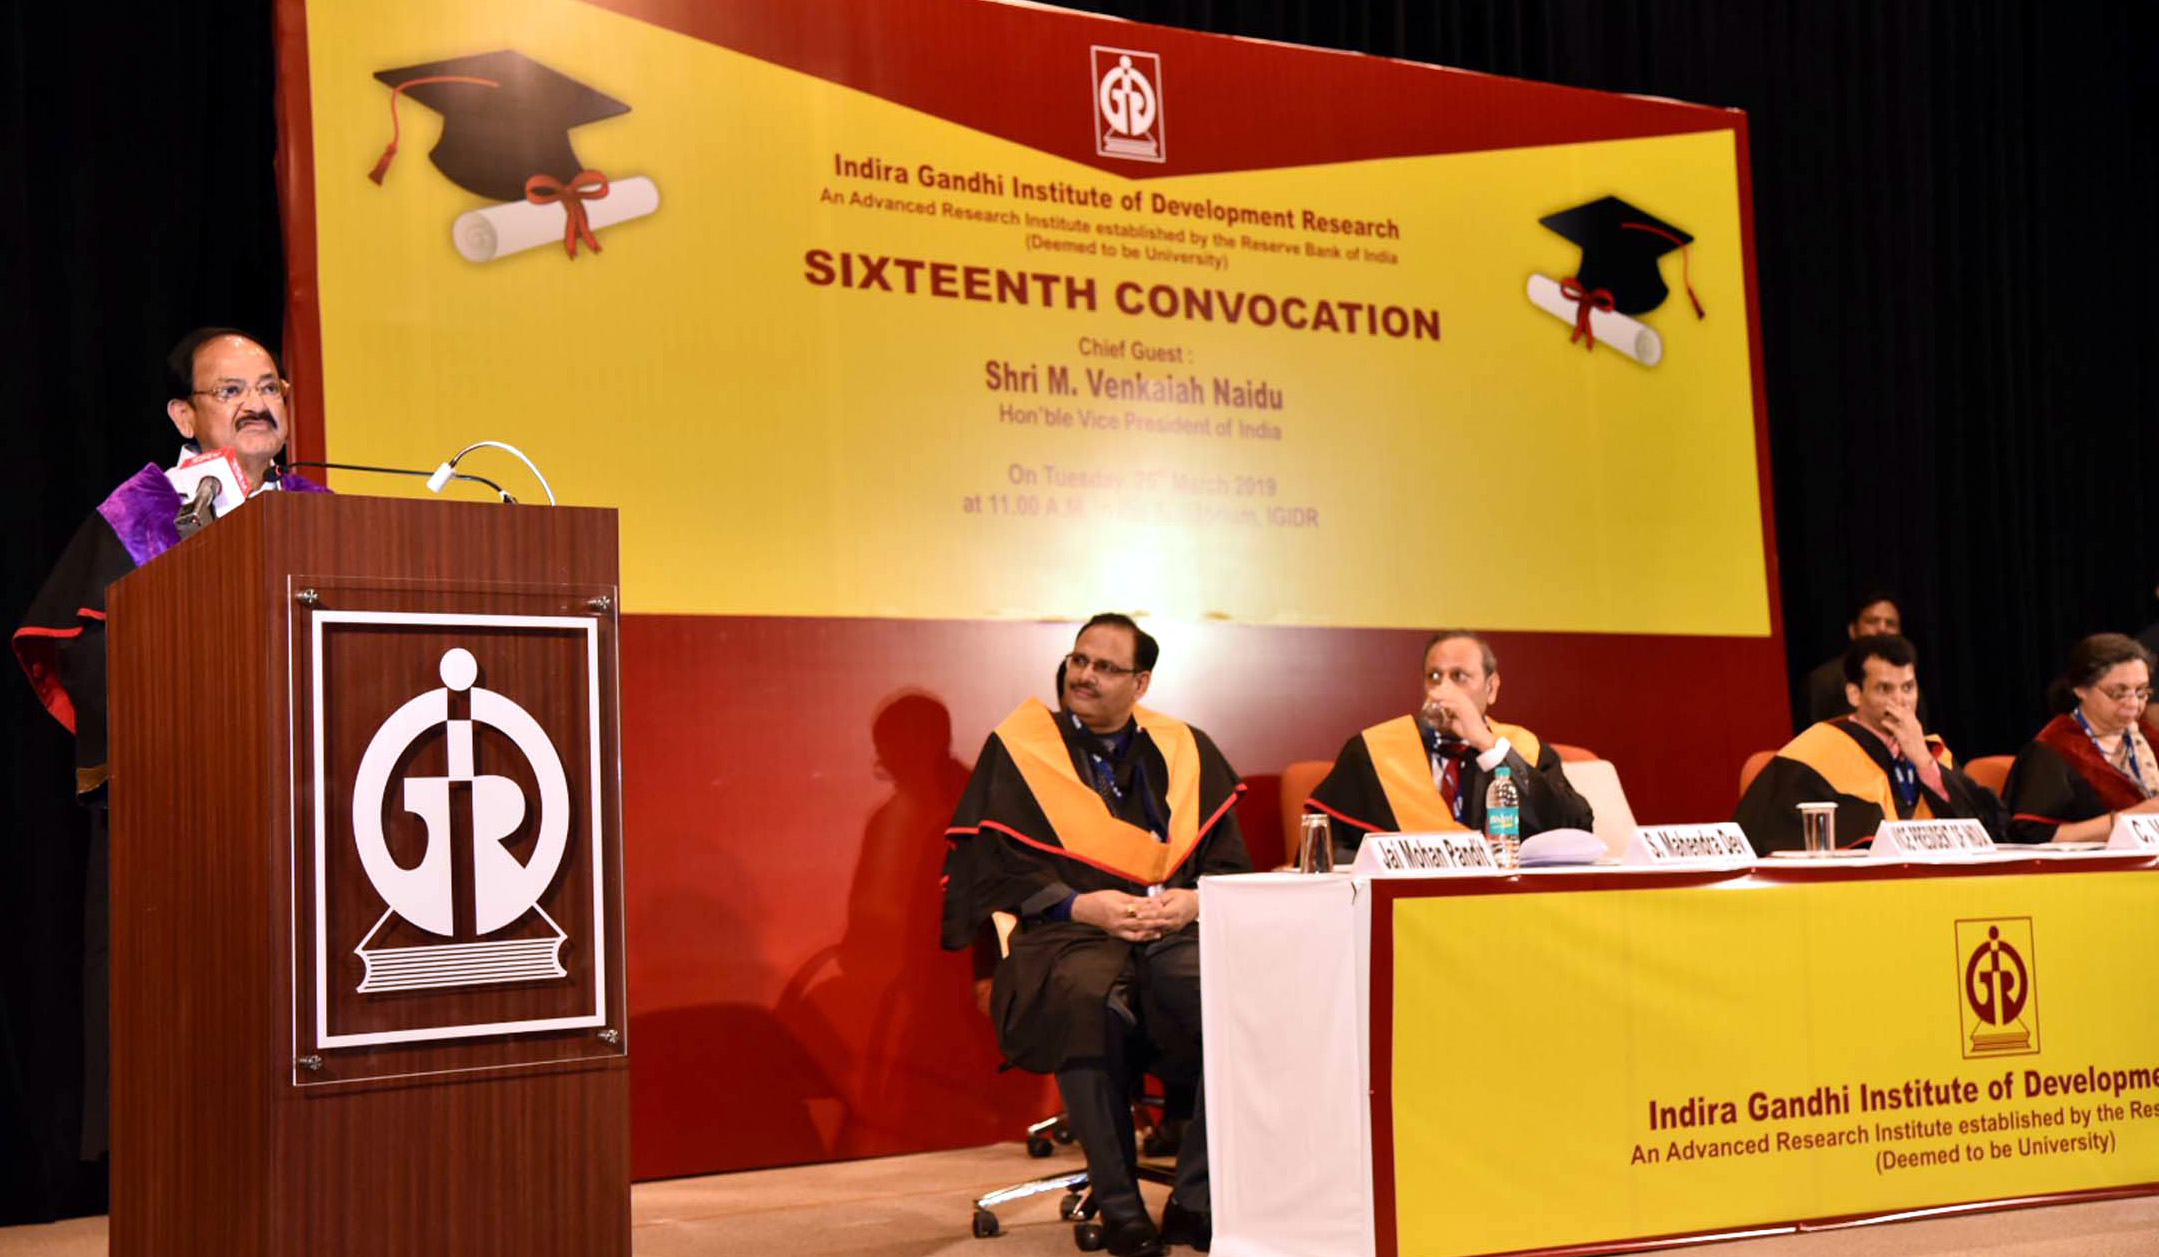 Shri M. Venkaiah Naidu  Addresses 16th Convocation of Indira Gandhi Institute of Development Research